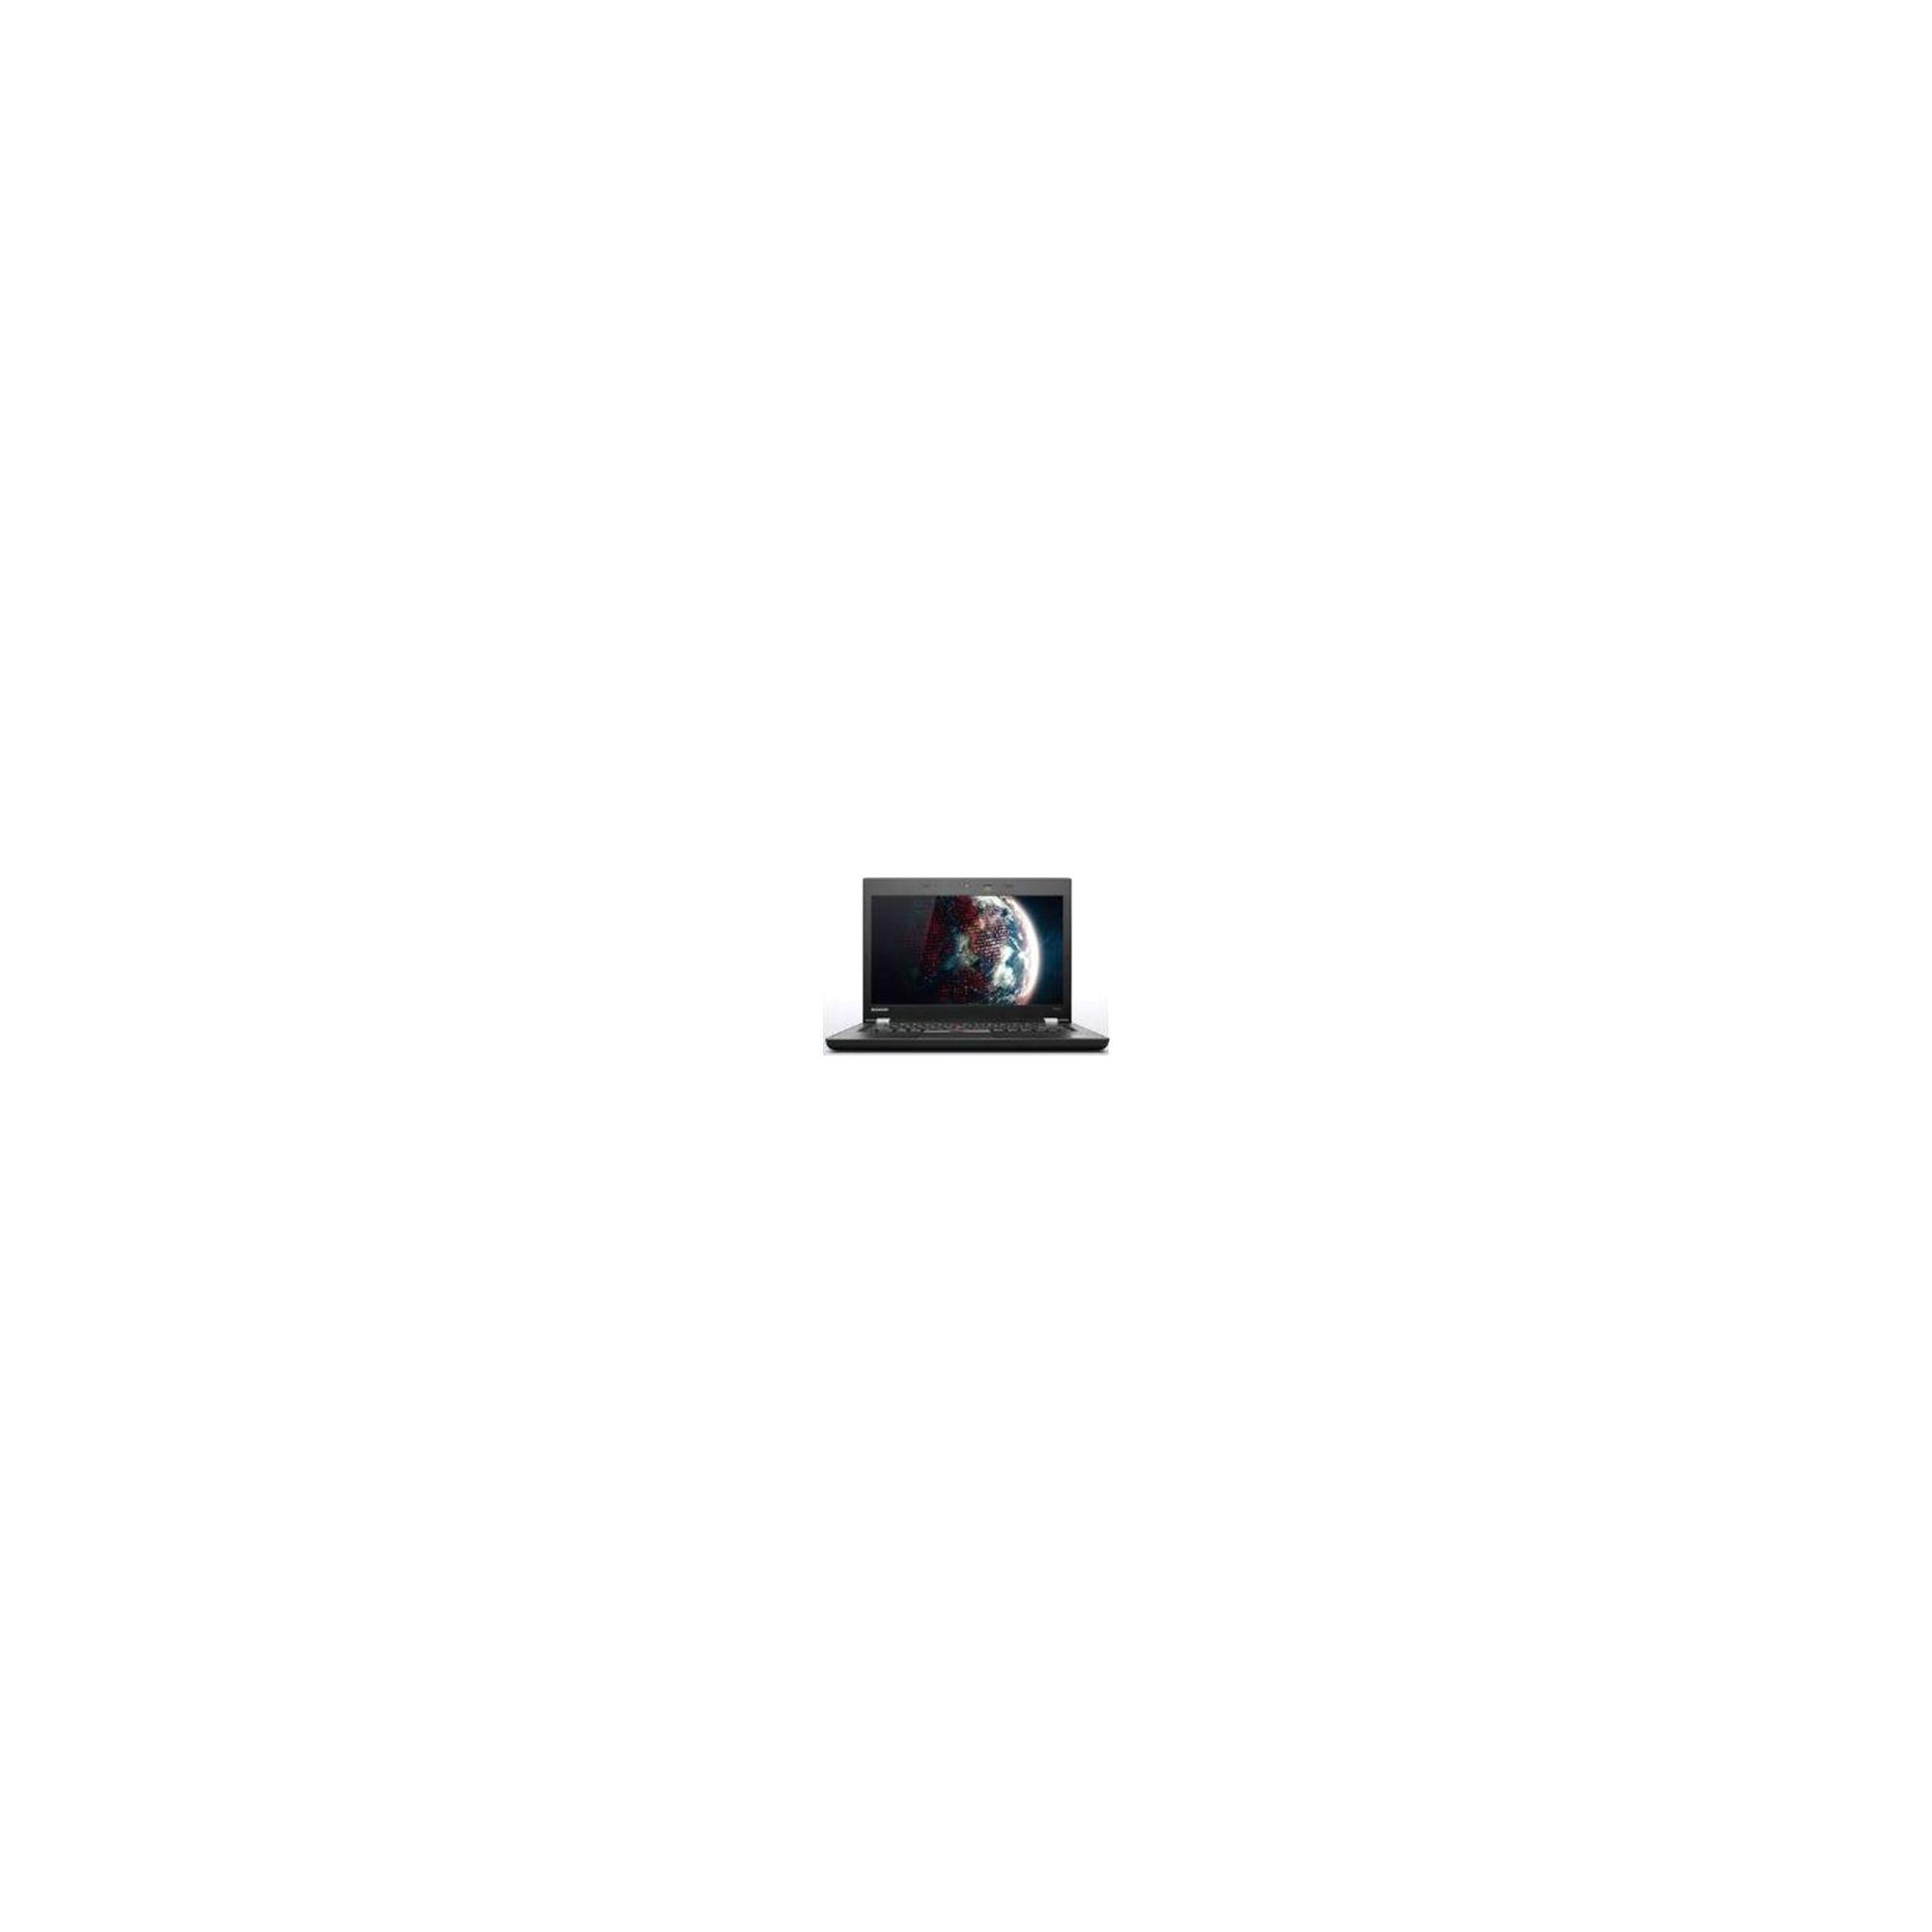 Lenovo ThinkPad T430u 335337G (14.0 inch) Notebook Core i5 (3317U) 1.7GHz 4GB 500GB WLAN BT Webcam Windows 7 Pro 64-bit (Intel HD Graphics) Black at Tesco Direct